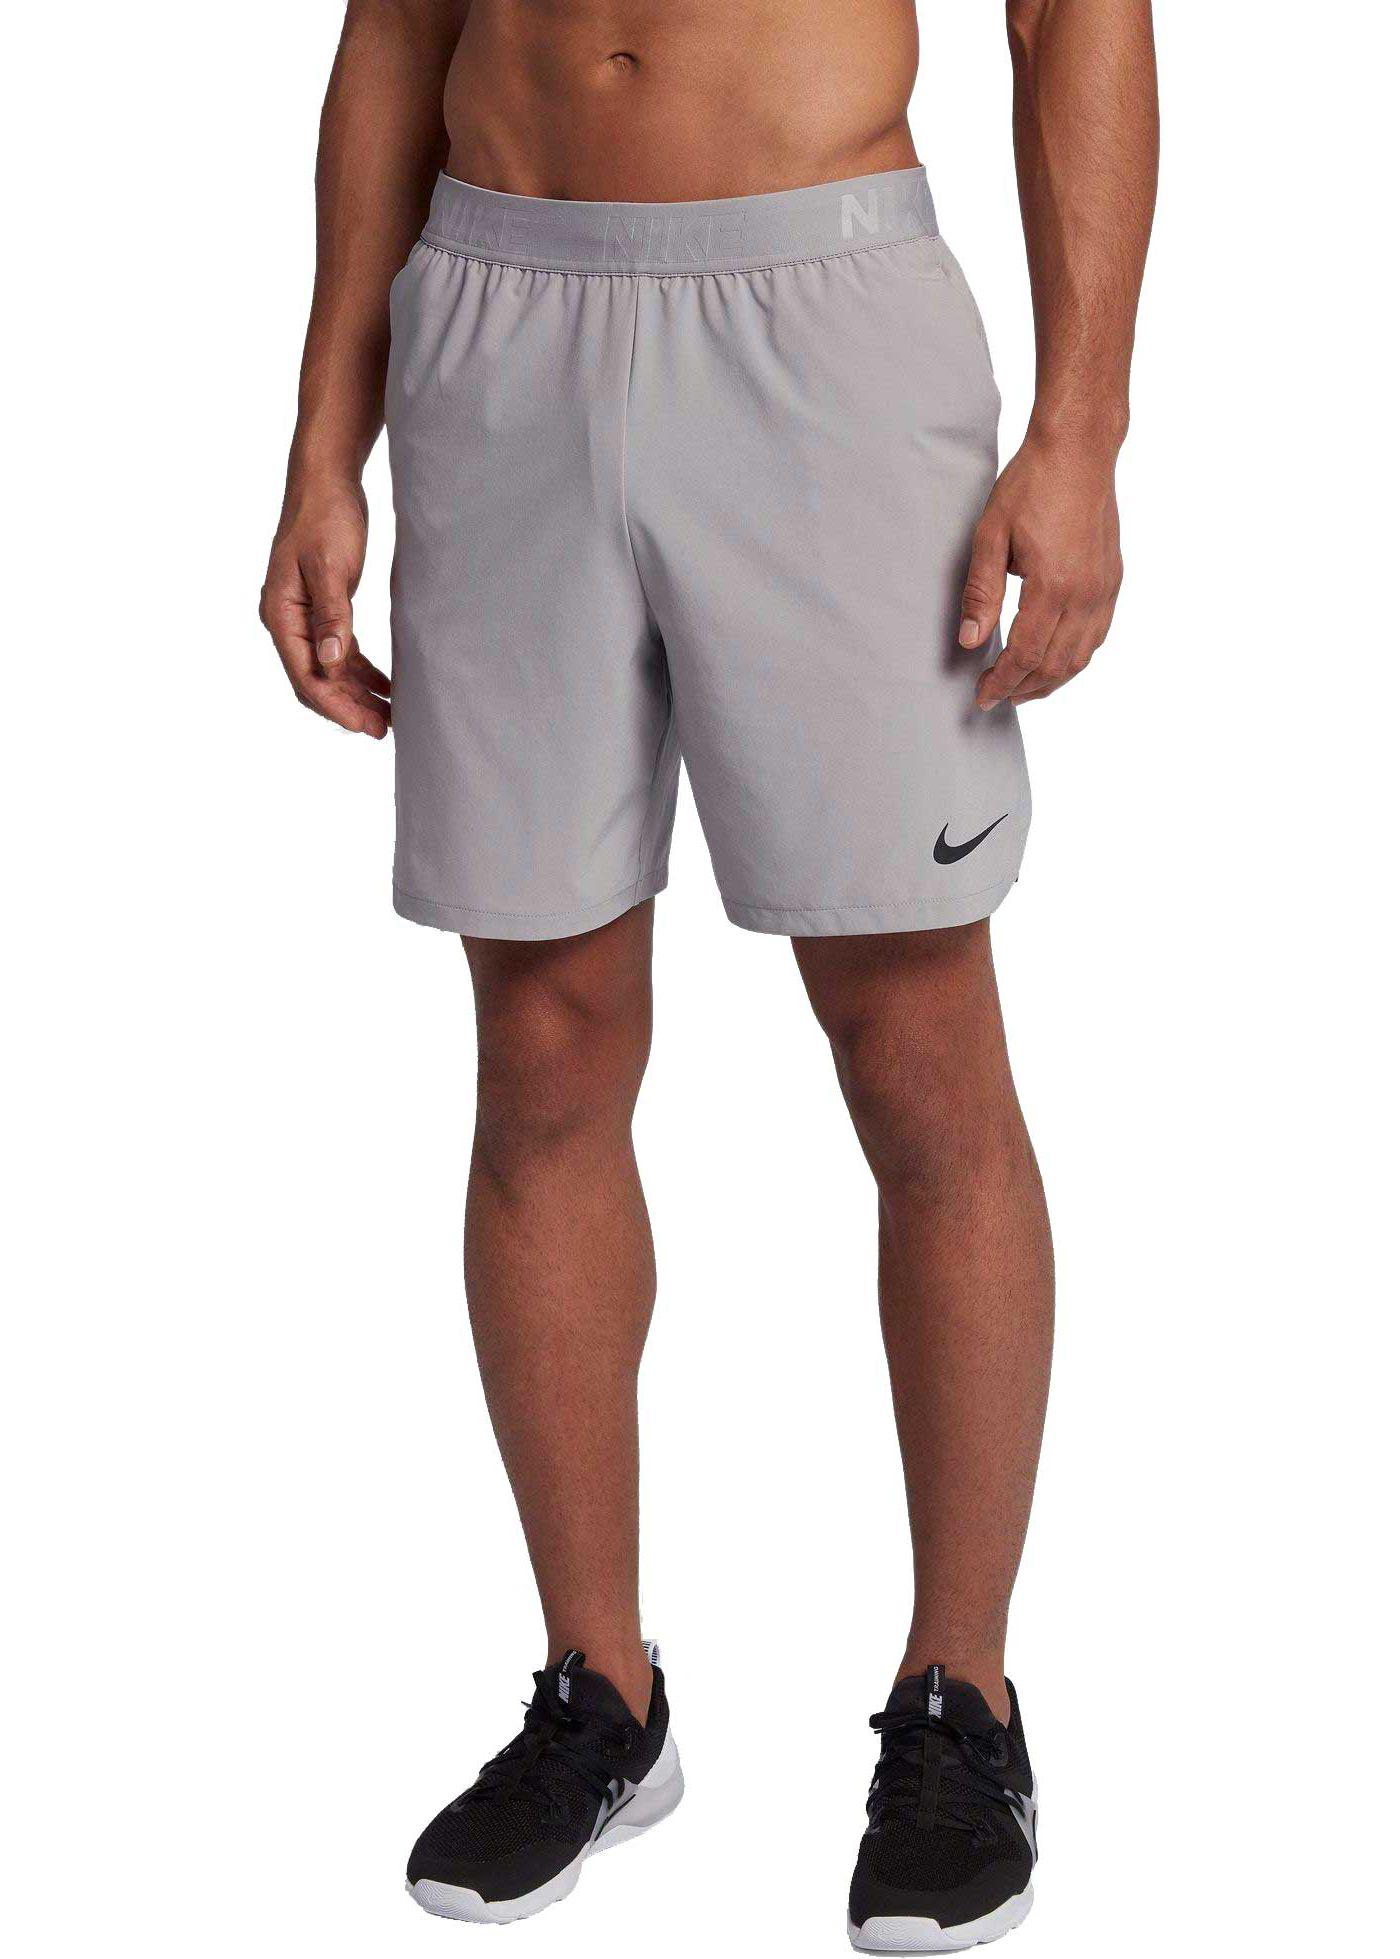 Nike Men's Flex Vent Max 2.0 Training Shorts (Regular and Big & Tall)